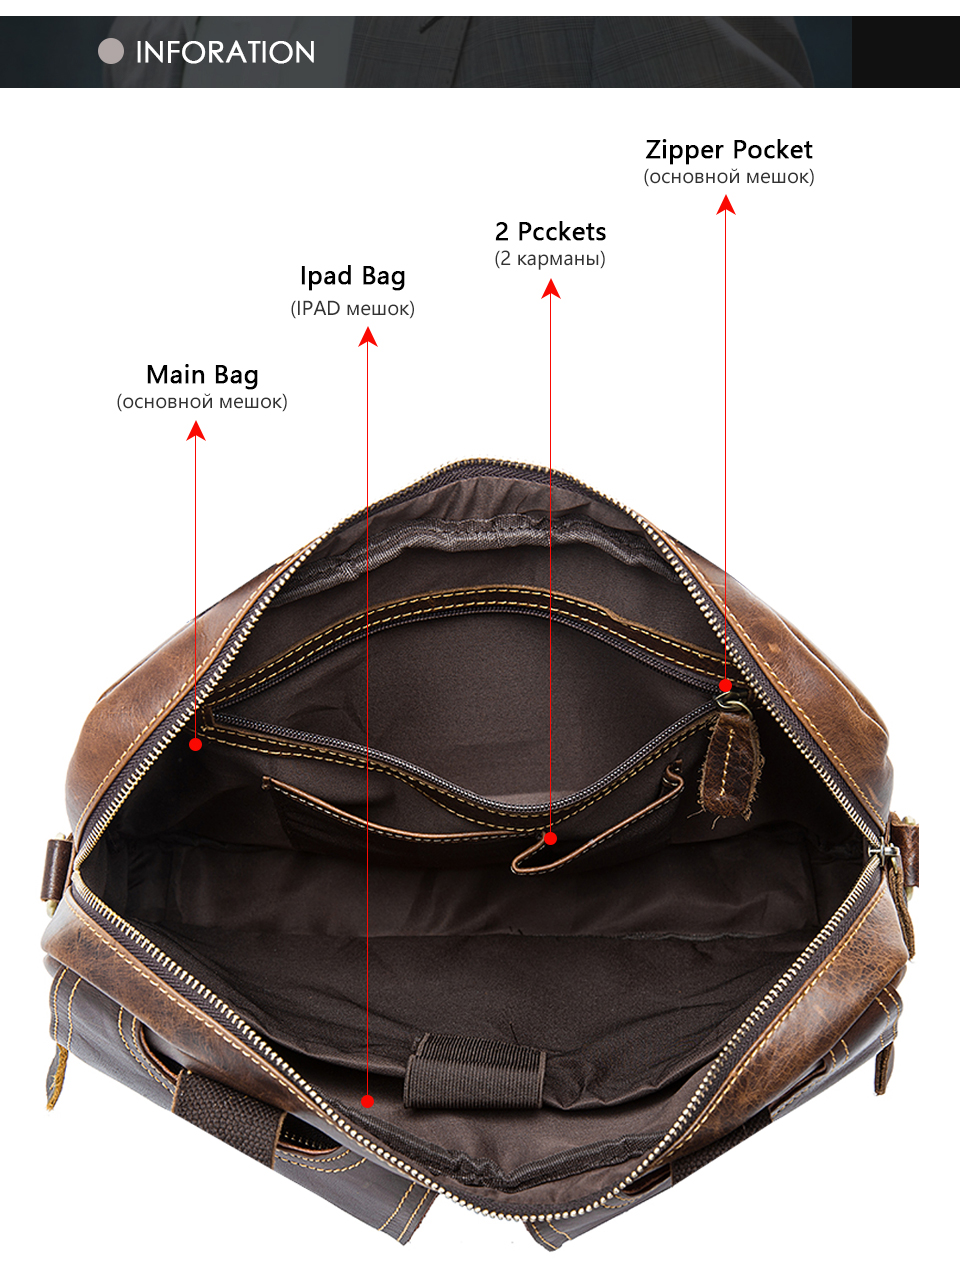 Hc1ec3acd8f194bb3ab43ceabd33faf20h MVA men's bag/briefcase leather office/laptop bag for men's genuine leather bag business document man briefcase handbag 8002-1